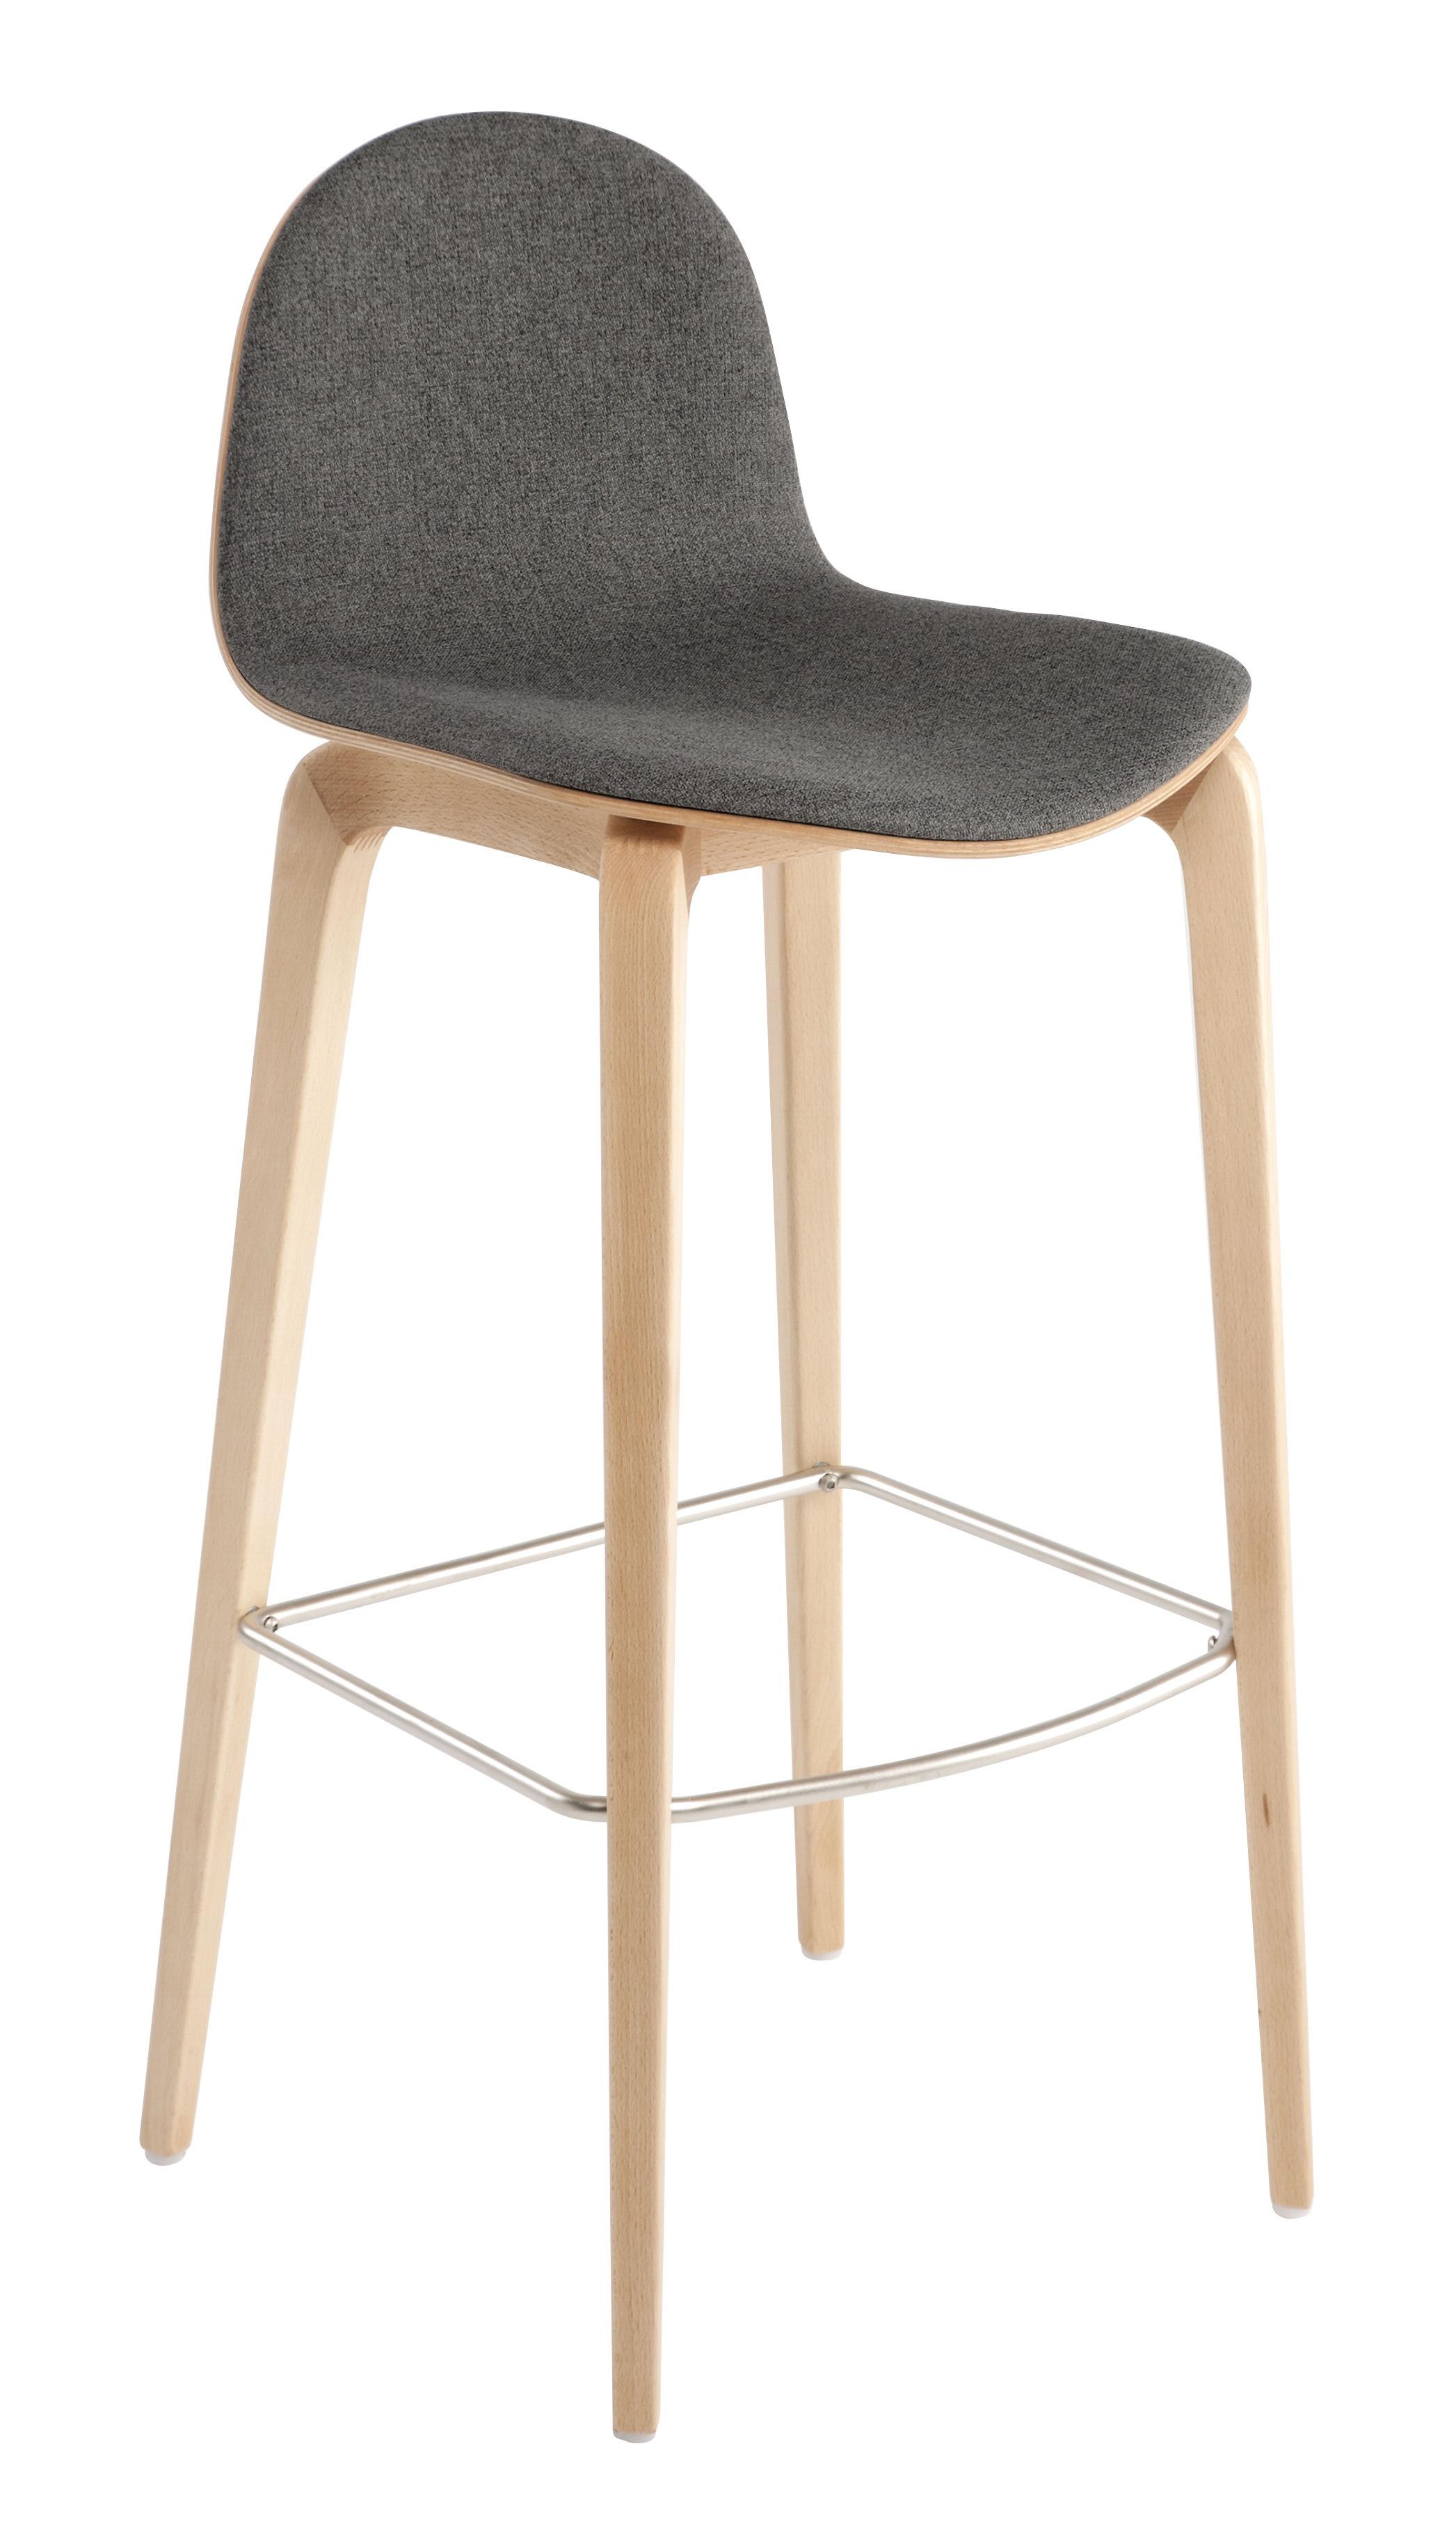 tabouret de bar bob h 74 cm tissu face interne tissu gris bois ondarreta. Black Bedroom Furniture Sets. Home Design Ideas